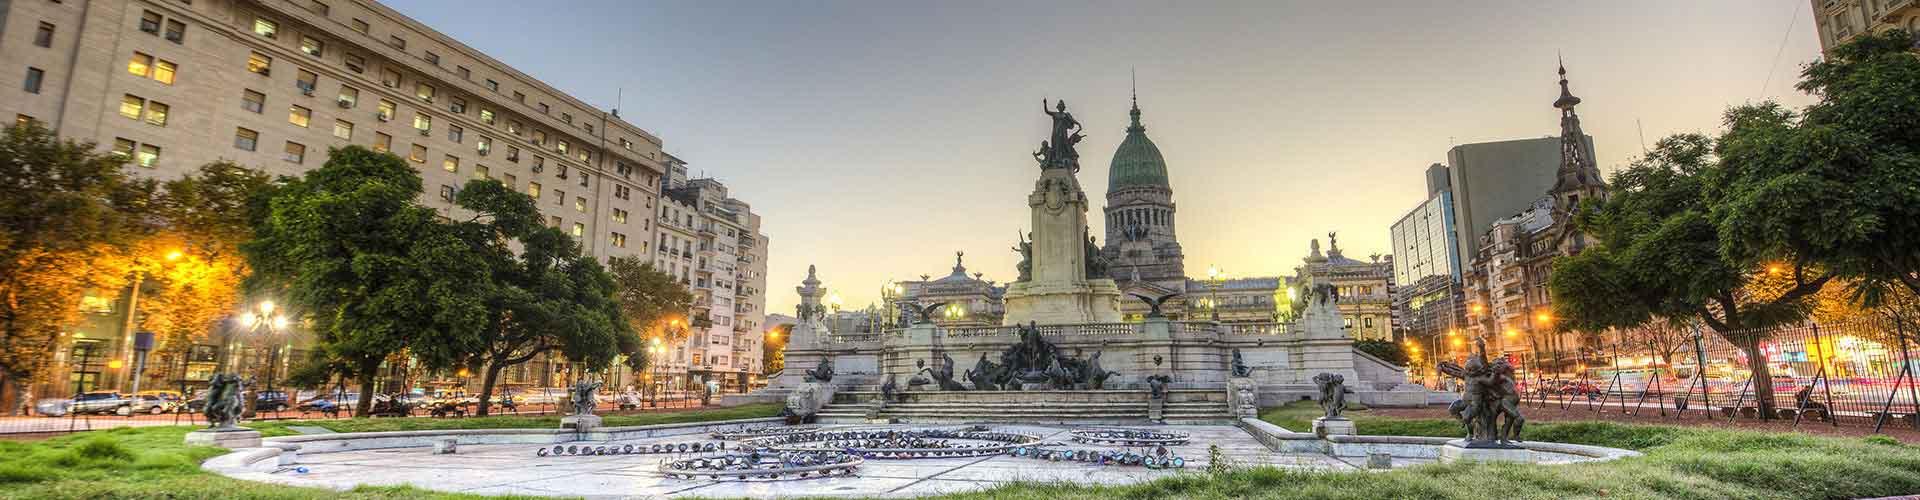 Buenos Aires - Hostele w mieście: Buenos Aires, Mapy: Buenos Aires, Zdjęcia i Recenzje dla każdego hostelu w mieście Buenos Aires.